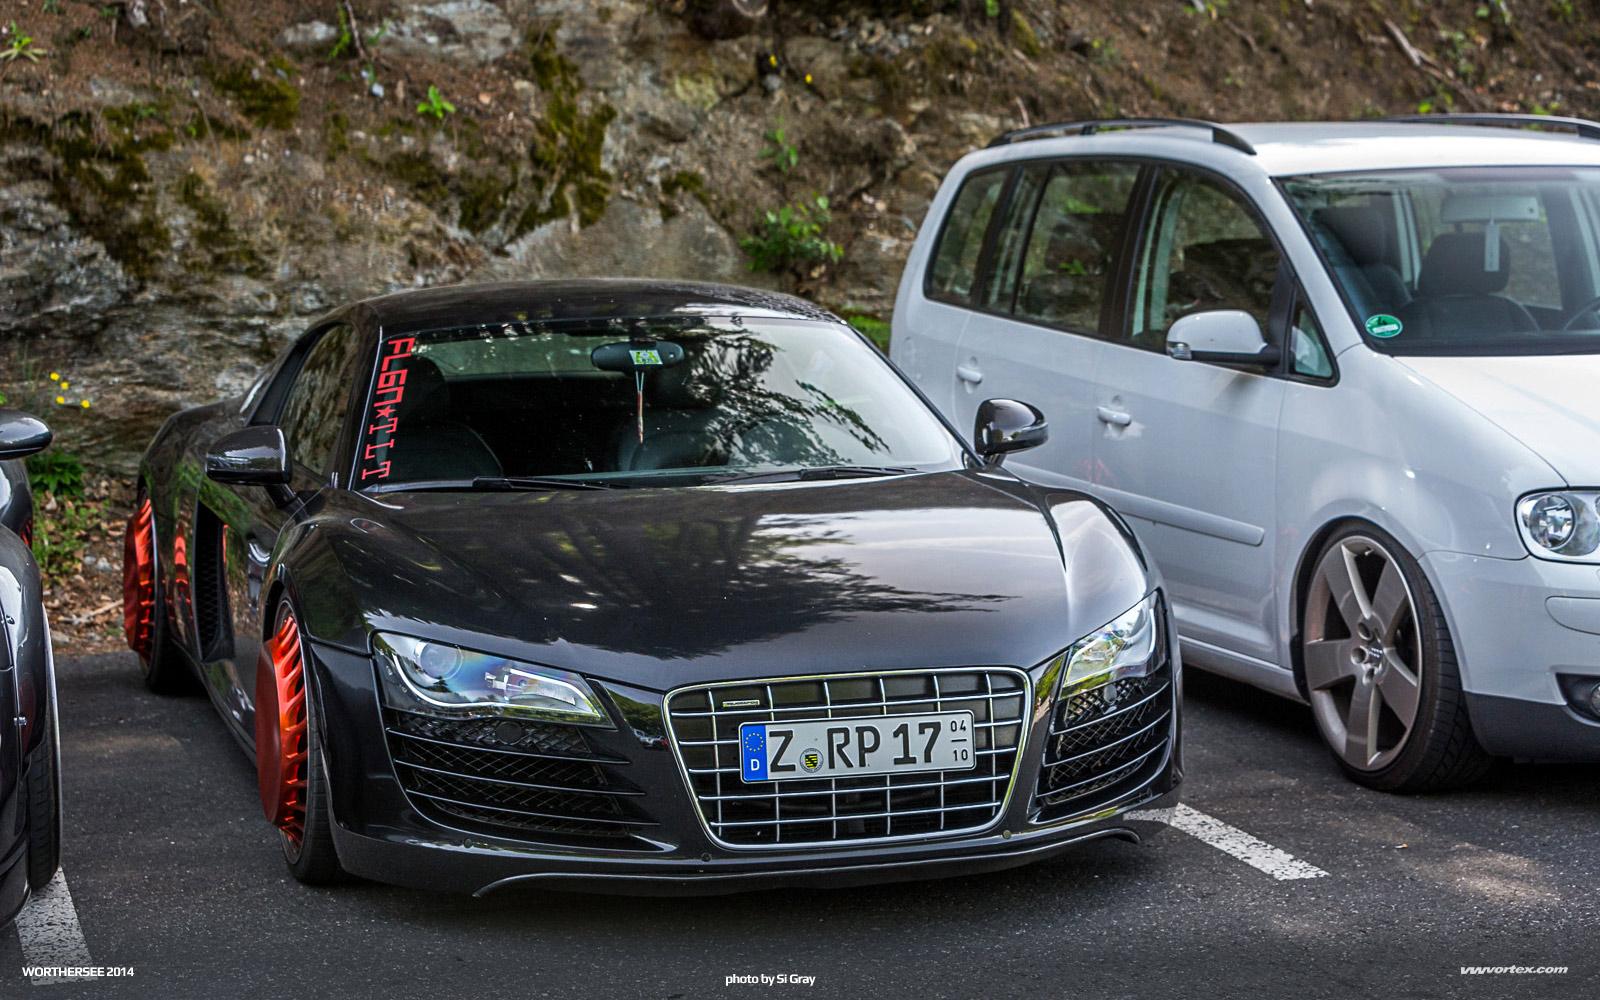 Audi TT clubsport turbo concept 2015 design drawing 842 600x300 photo